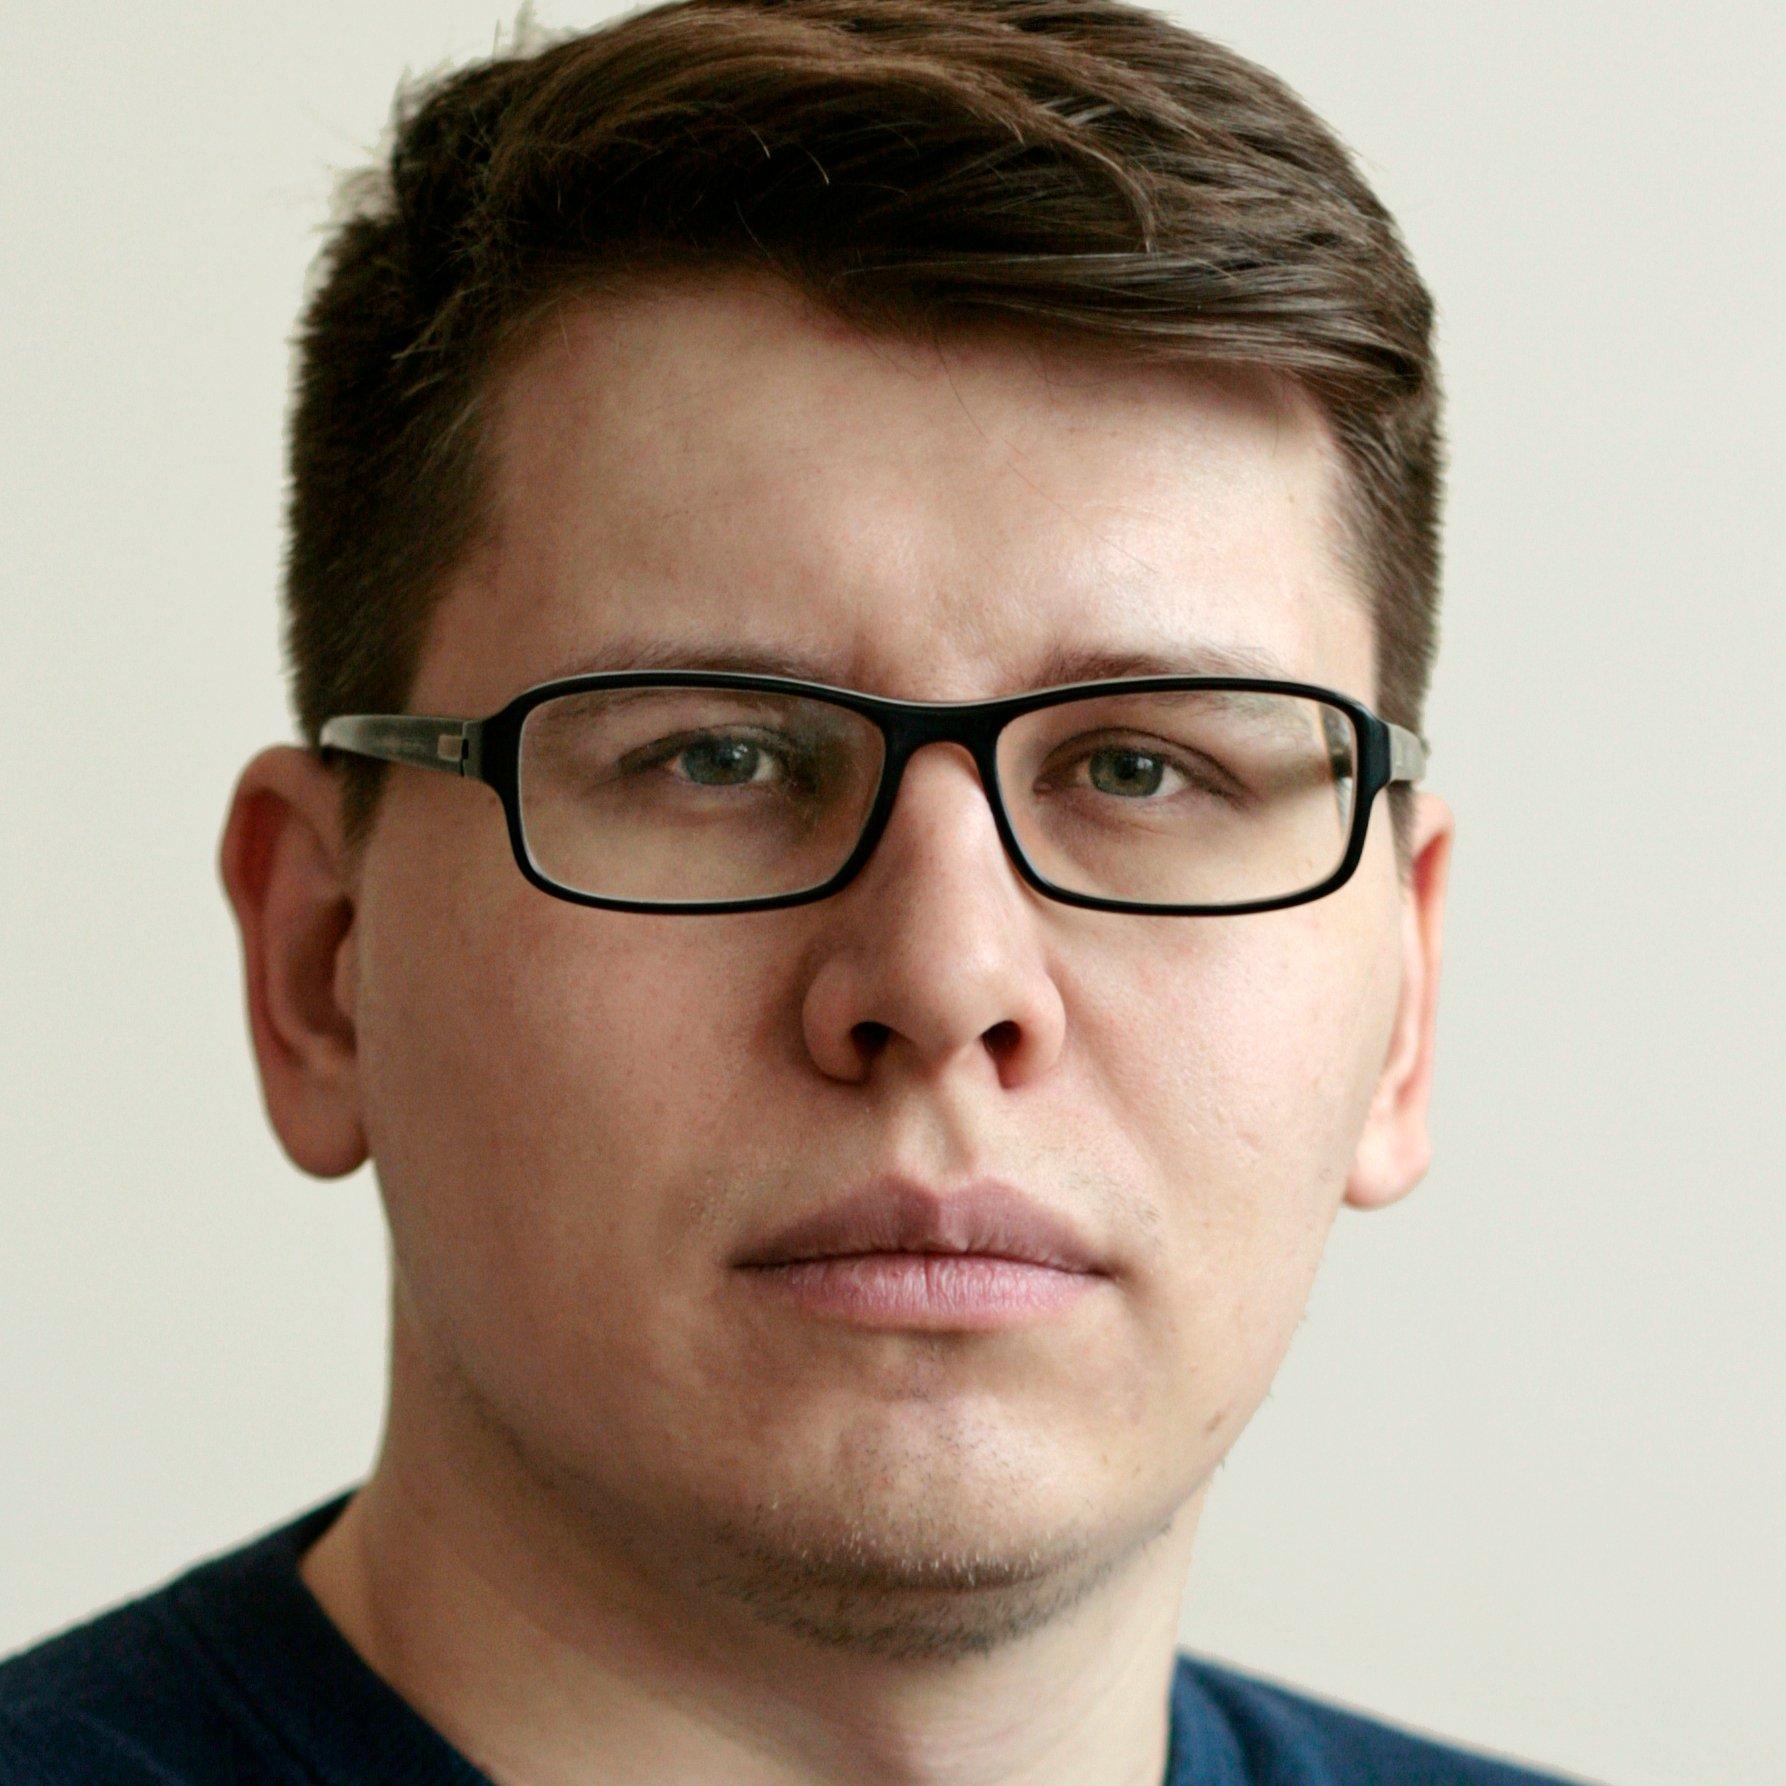 Максим Ксенофонтов, АМТ-Груп sq